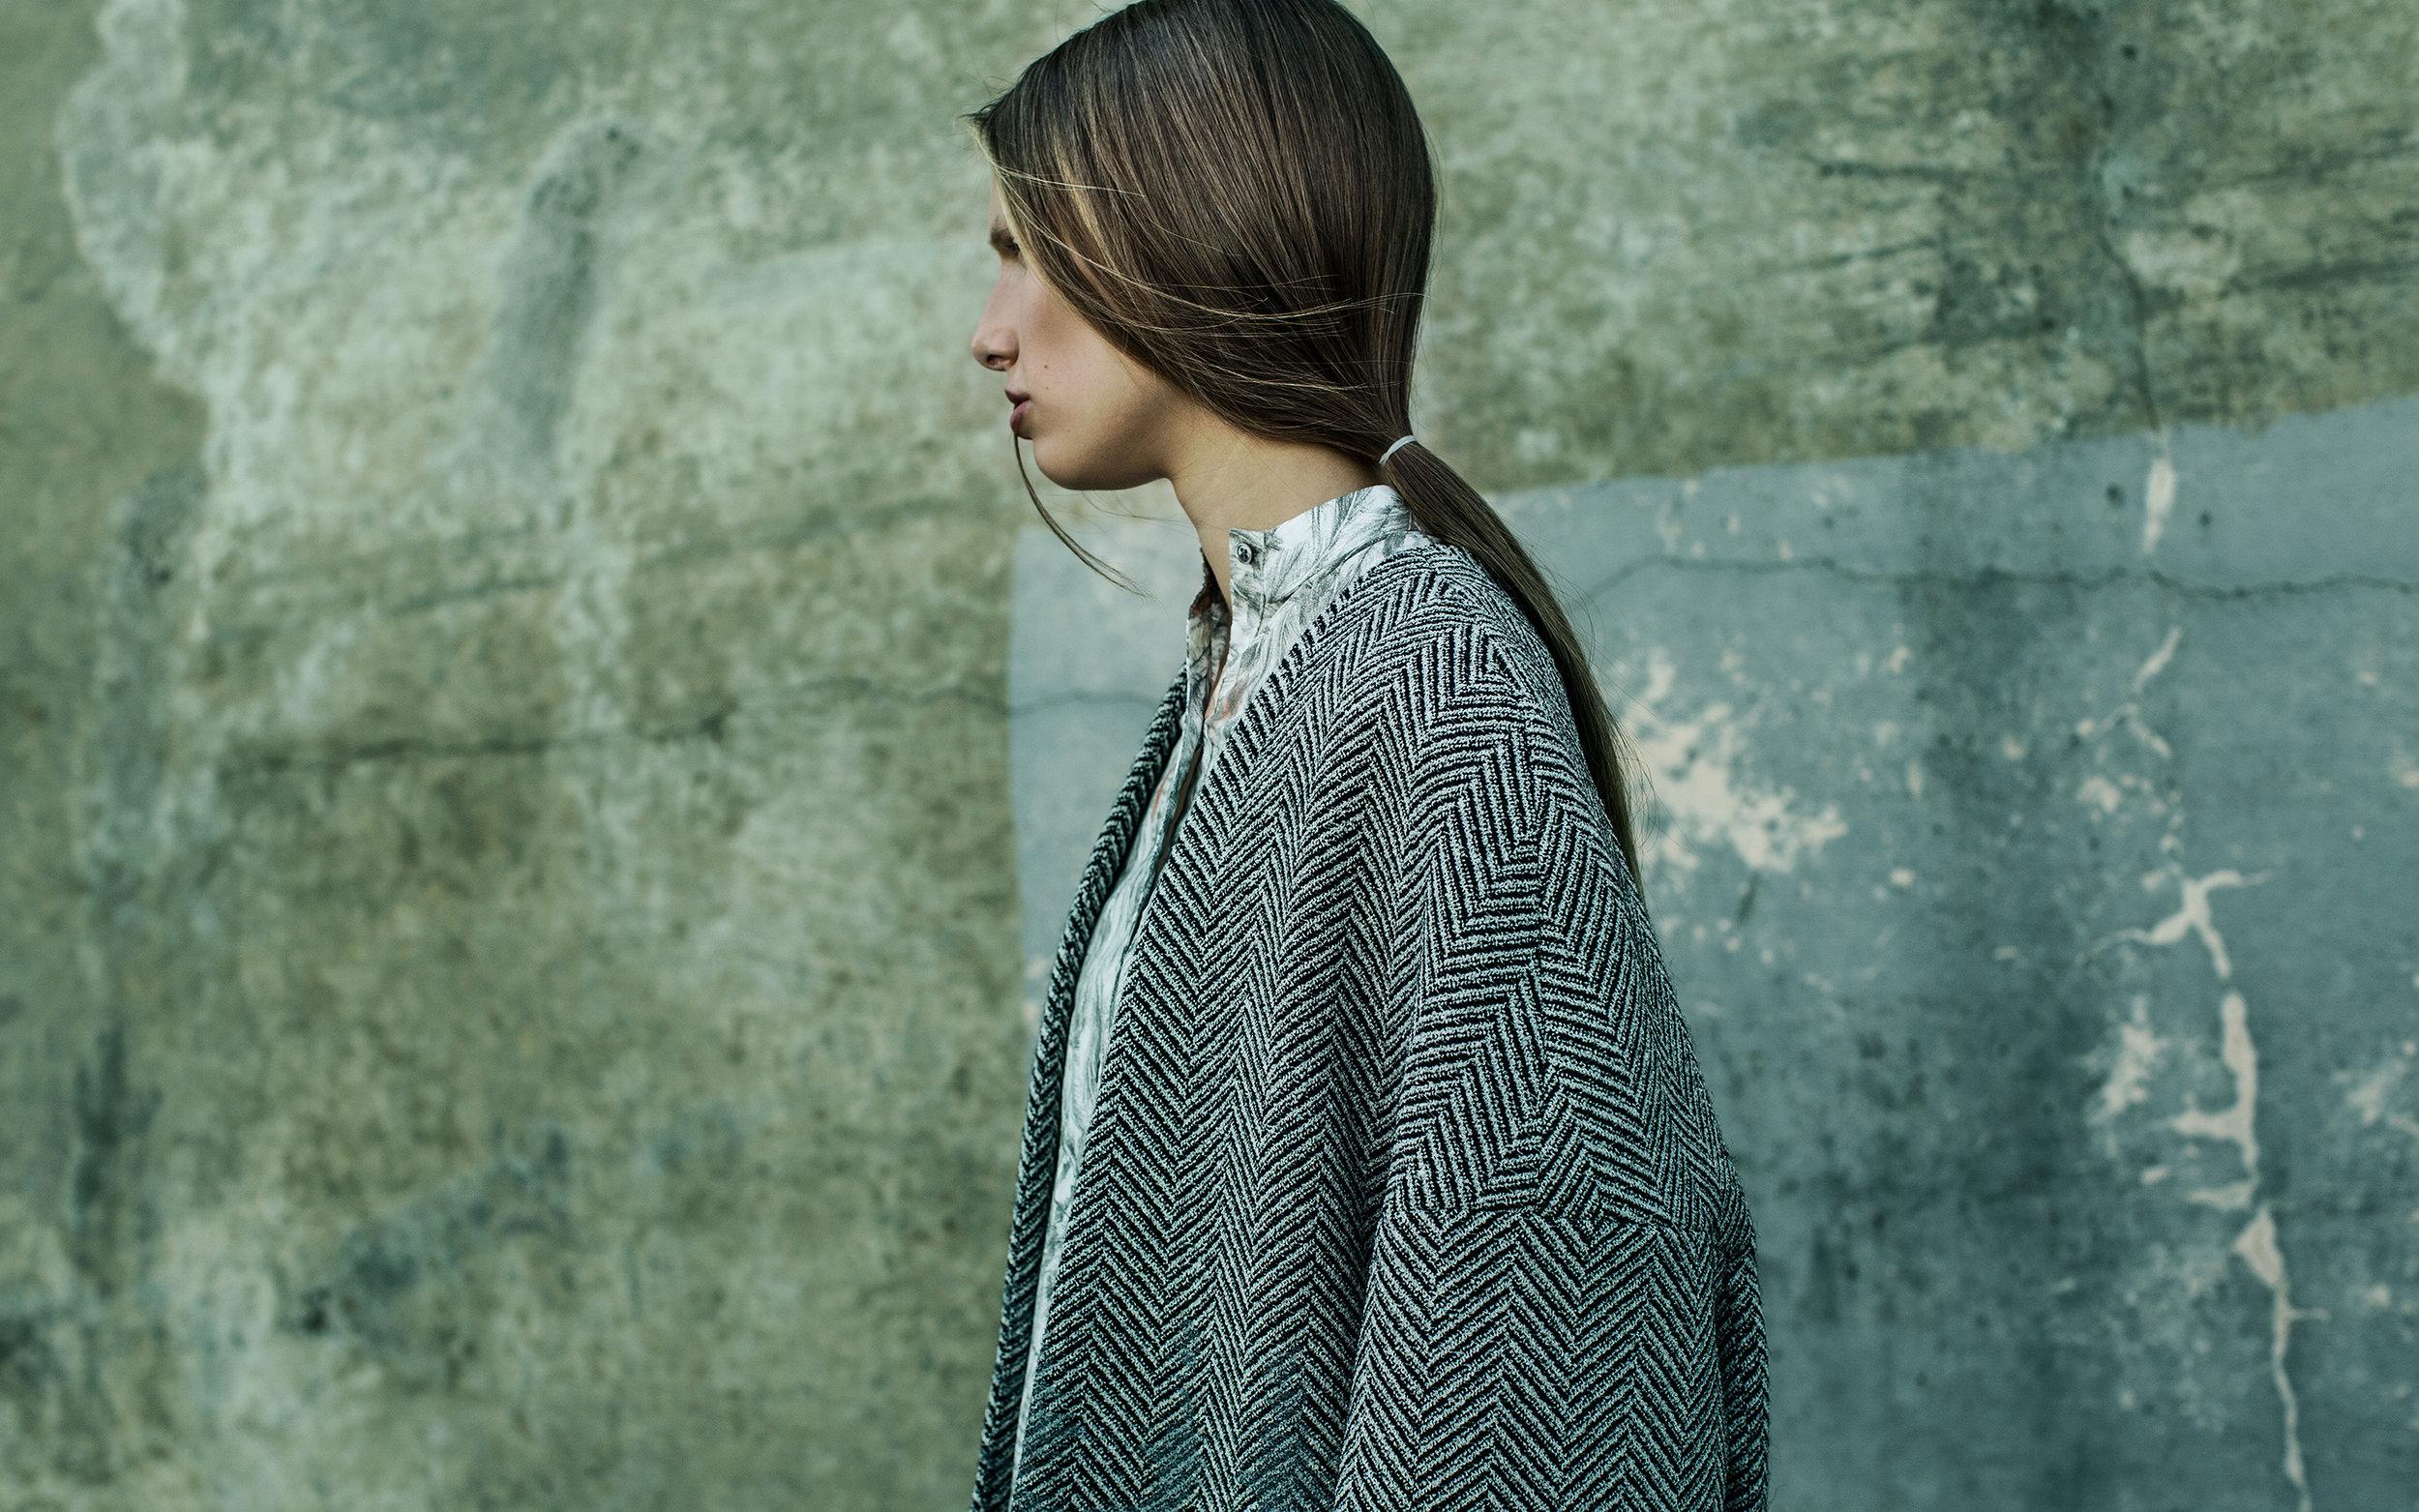 Coat by Youngjin Shin, BFA Fashion Design and Hsin Lee, BFA Textile Design. Shirt by Gwen Shih-Yao Lai, MFA Fashion Design.